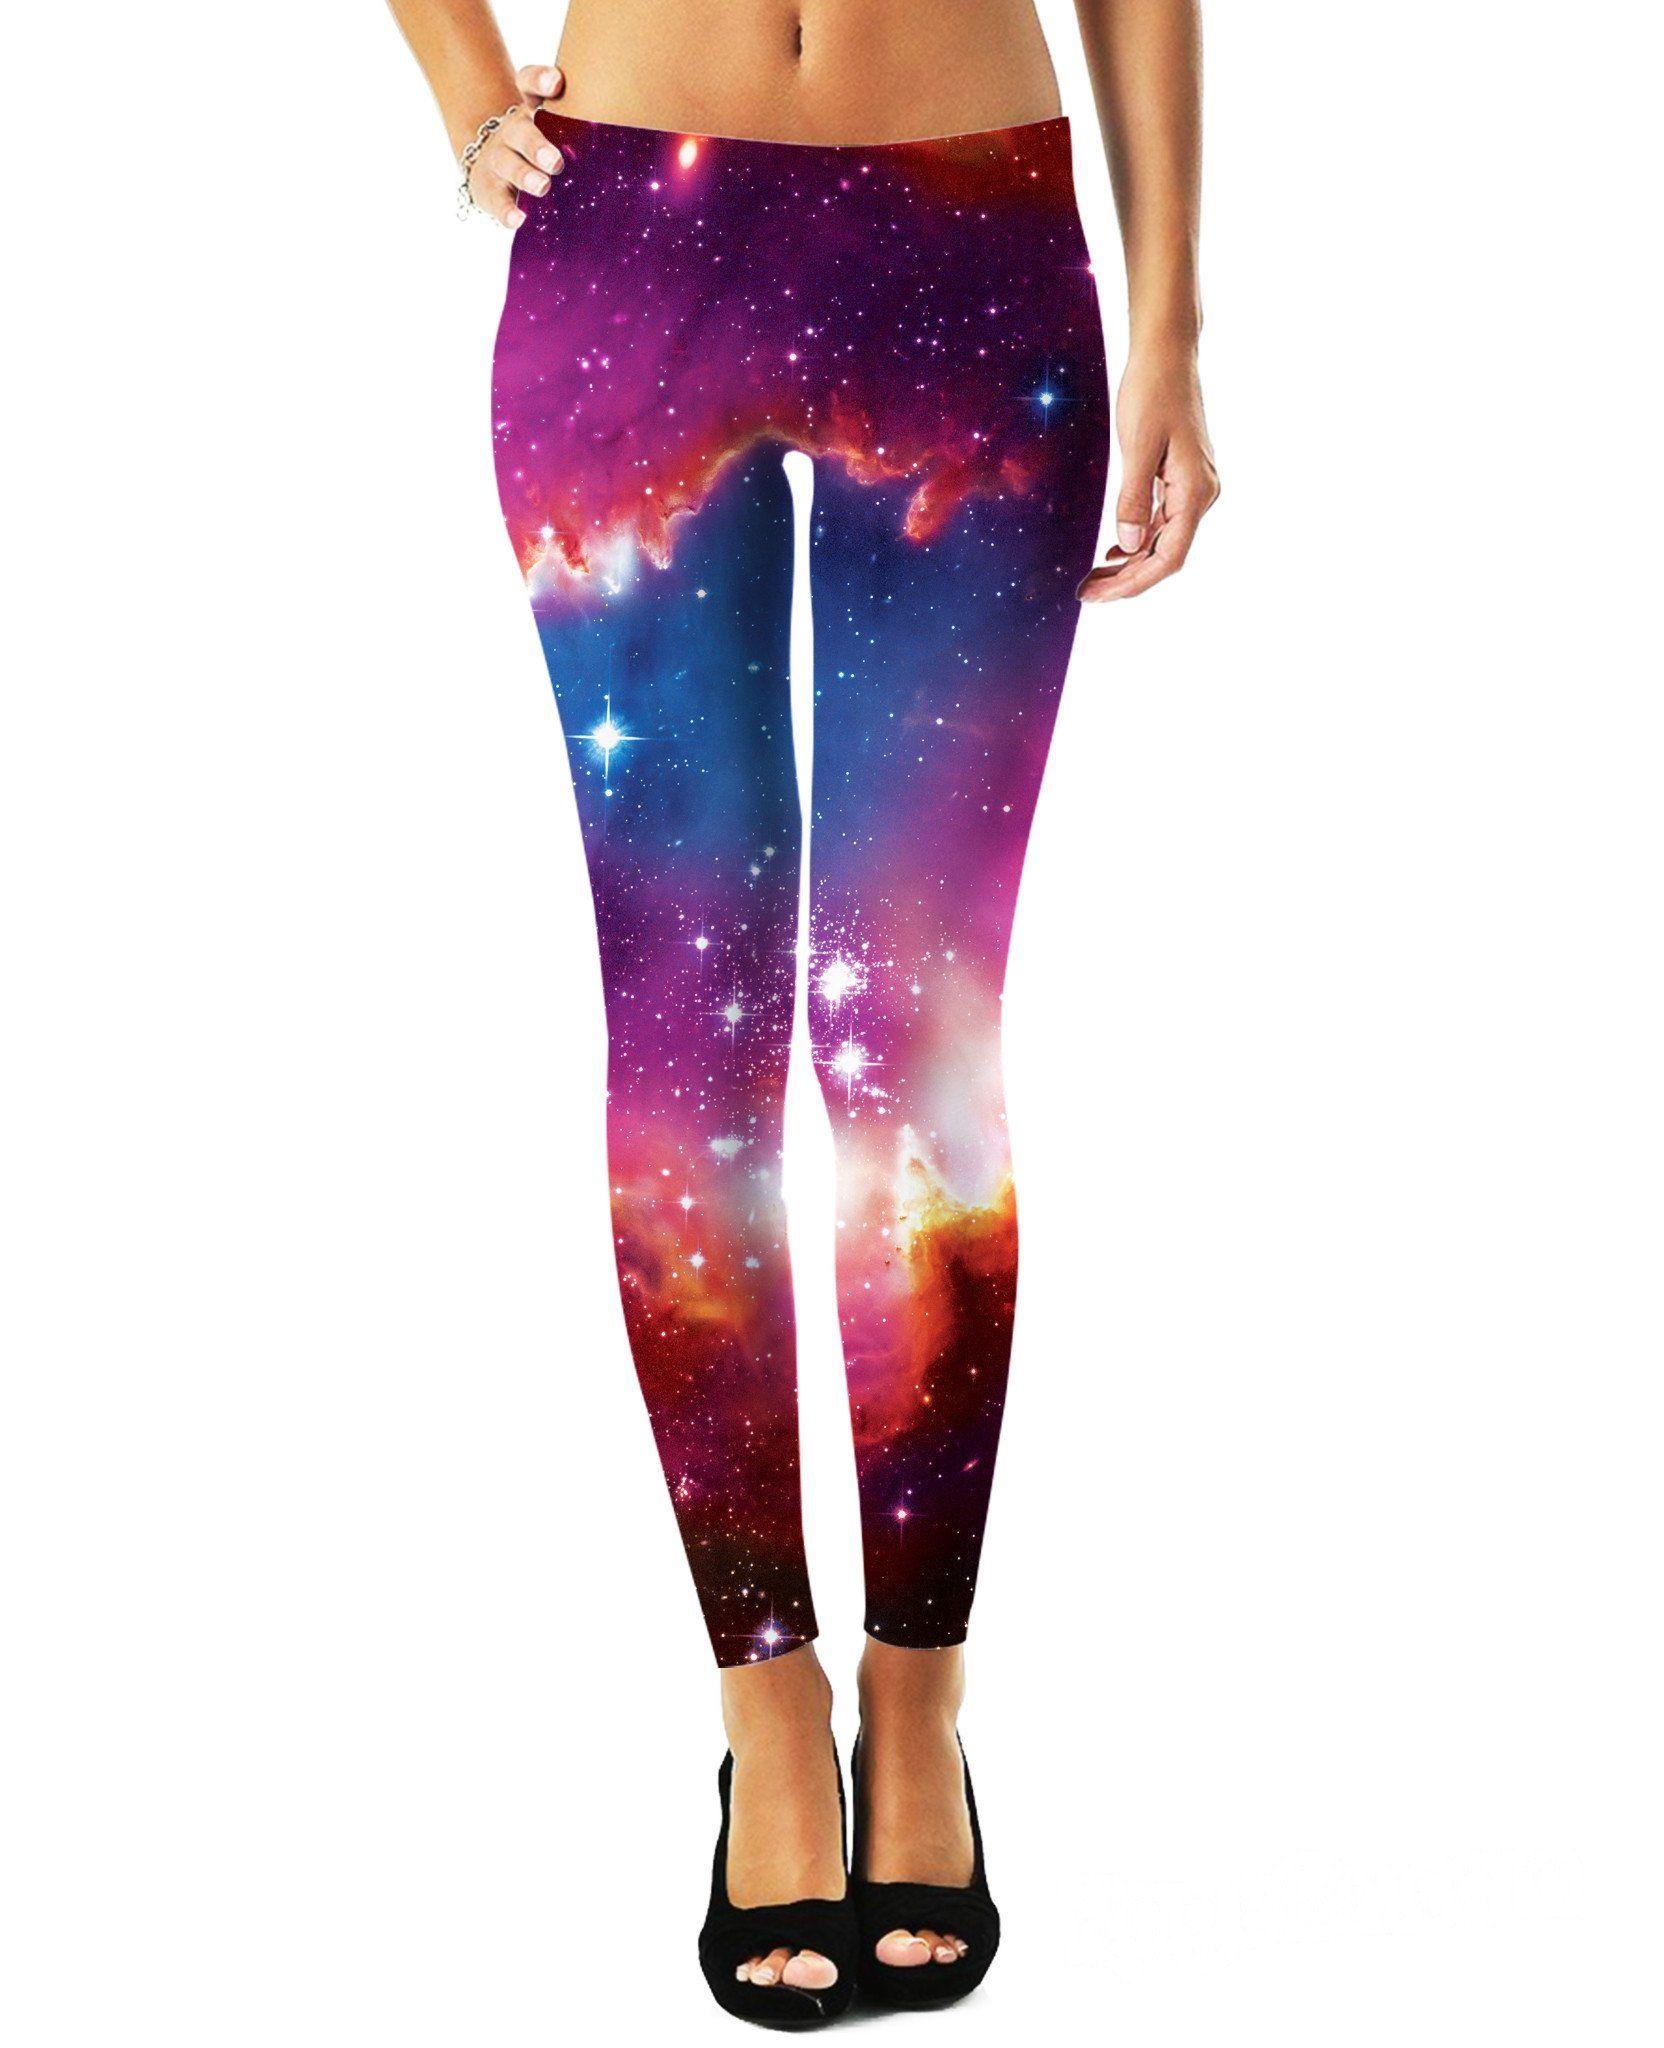 Cosmic Forces Leggings